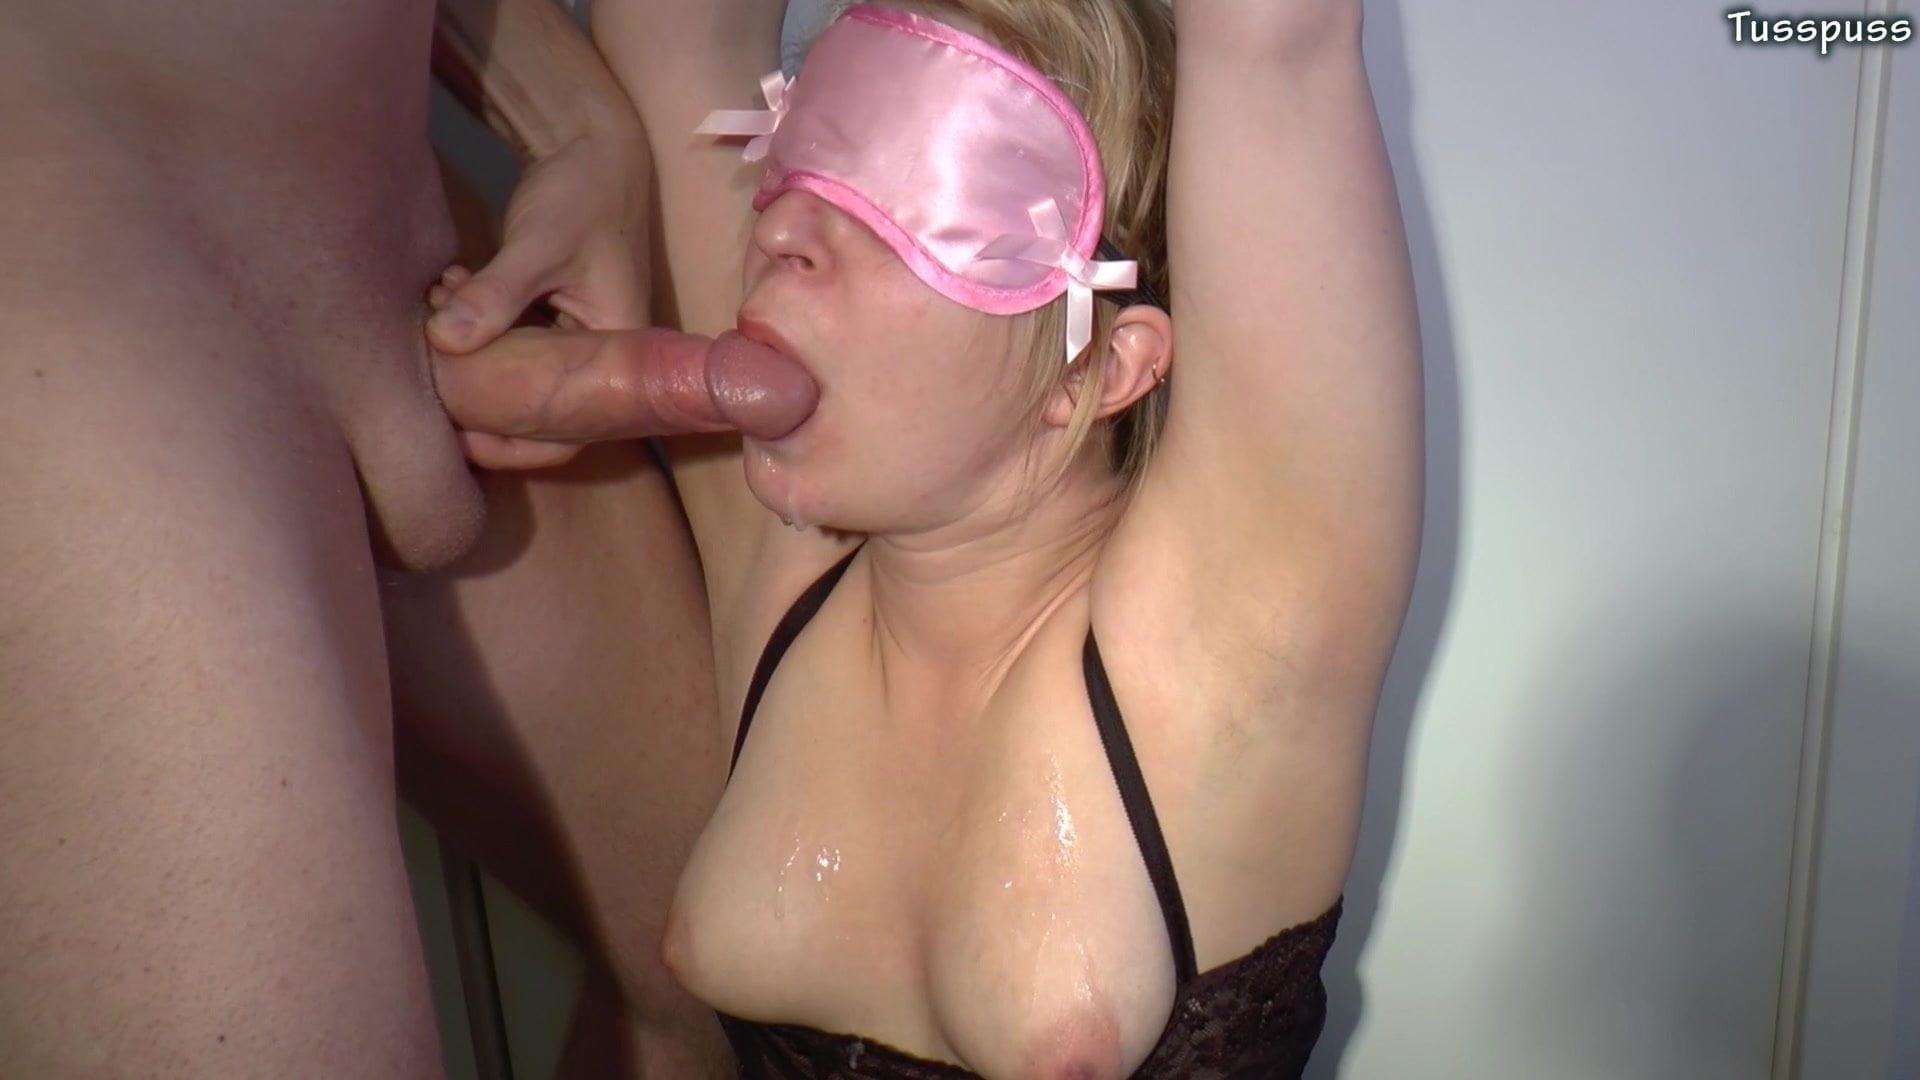 Amateur-Sex Mit Creampie